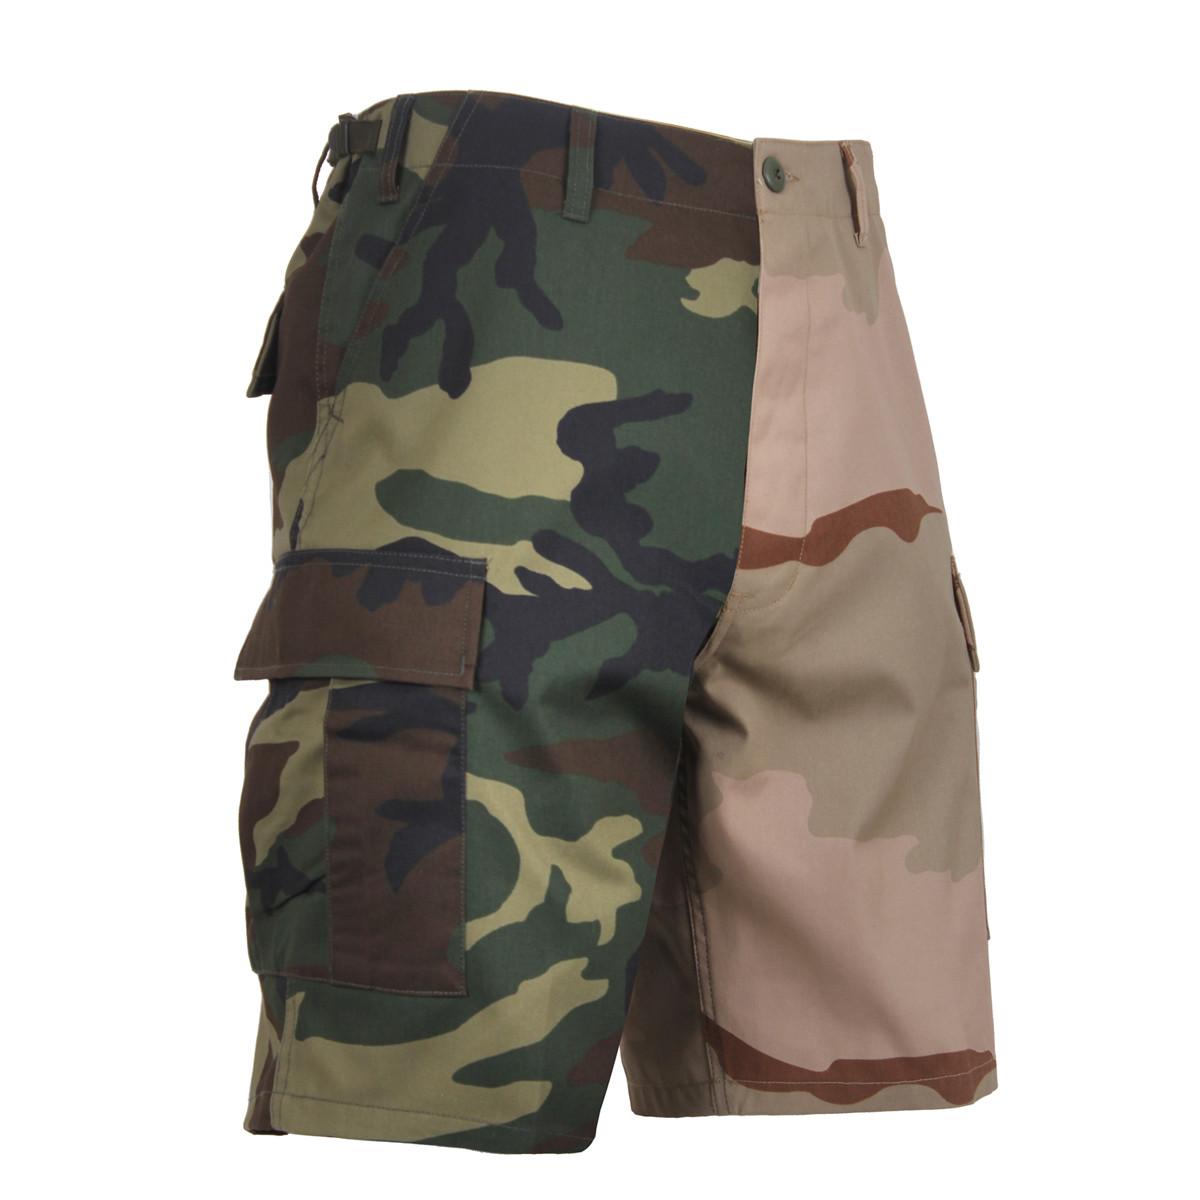 88f4de97a7 Shop Street Wear Two/Tone Camo Shorts - Fatigues Army Navy